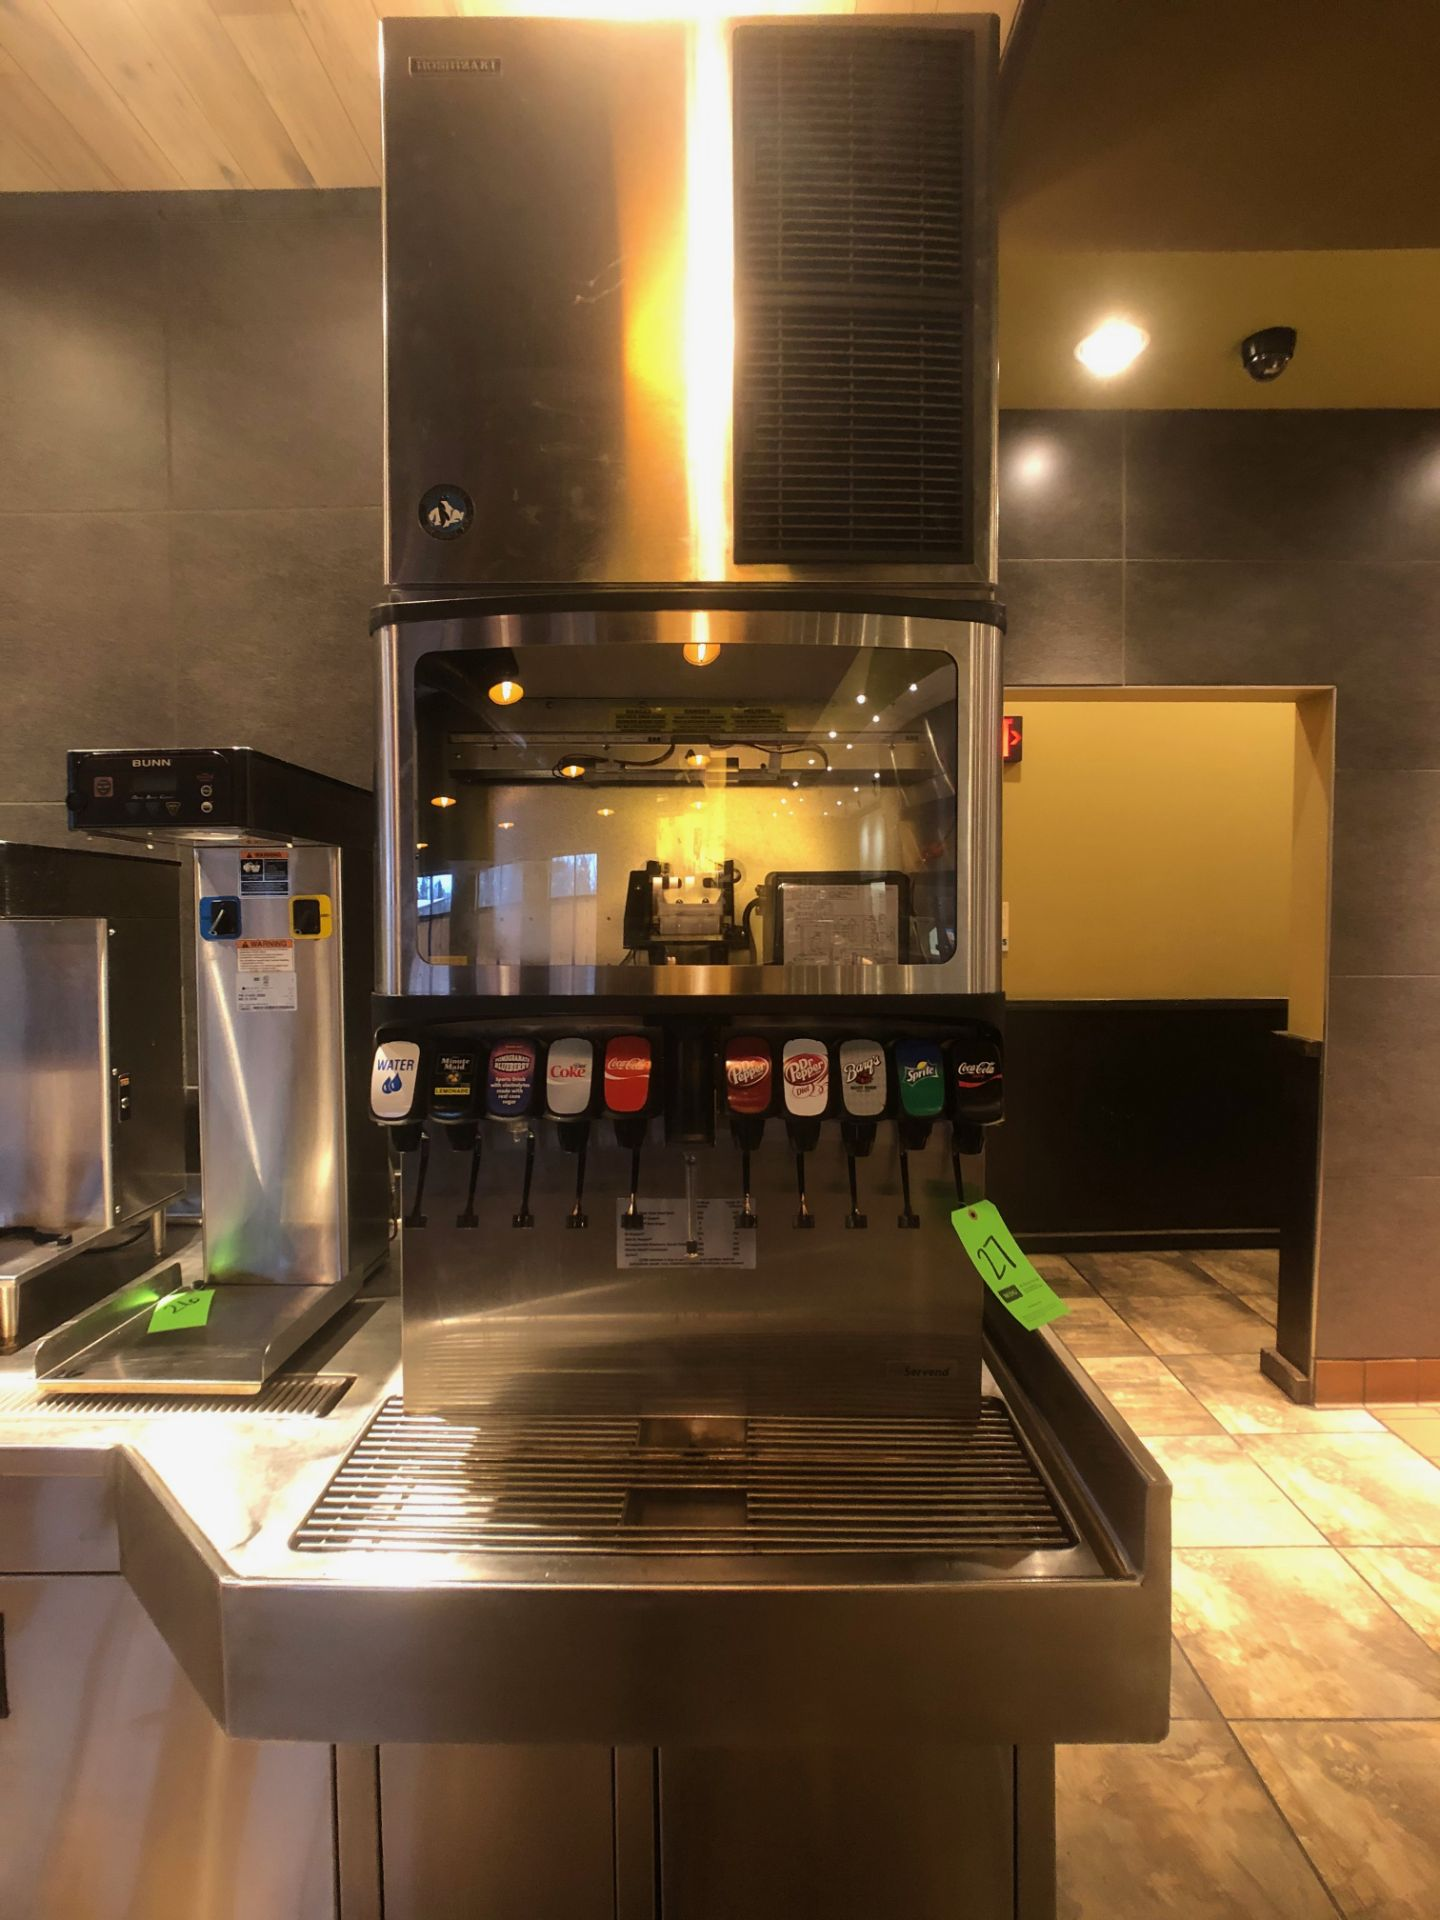 Manitowoc Beverage Systems 10-Valve Soft Drink Dispenser, Model SV250, S/N 610202454, with Hoshizaki